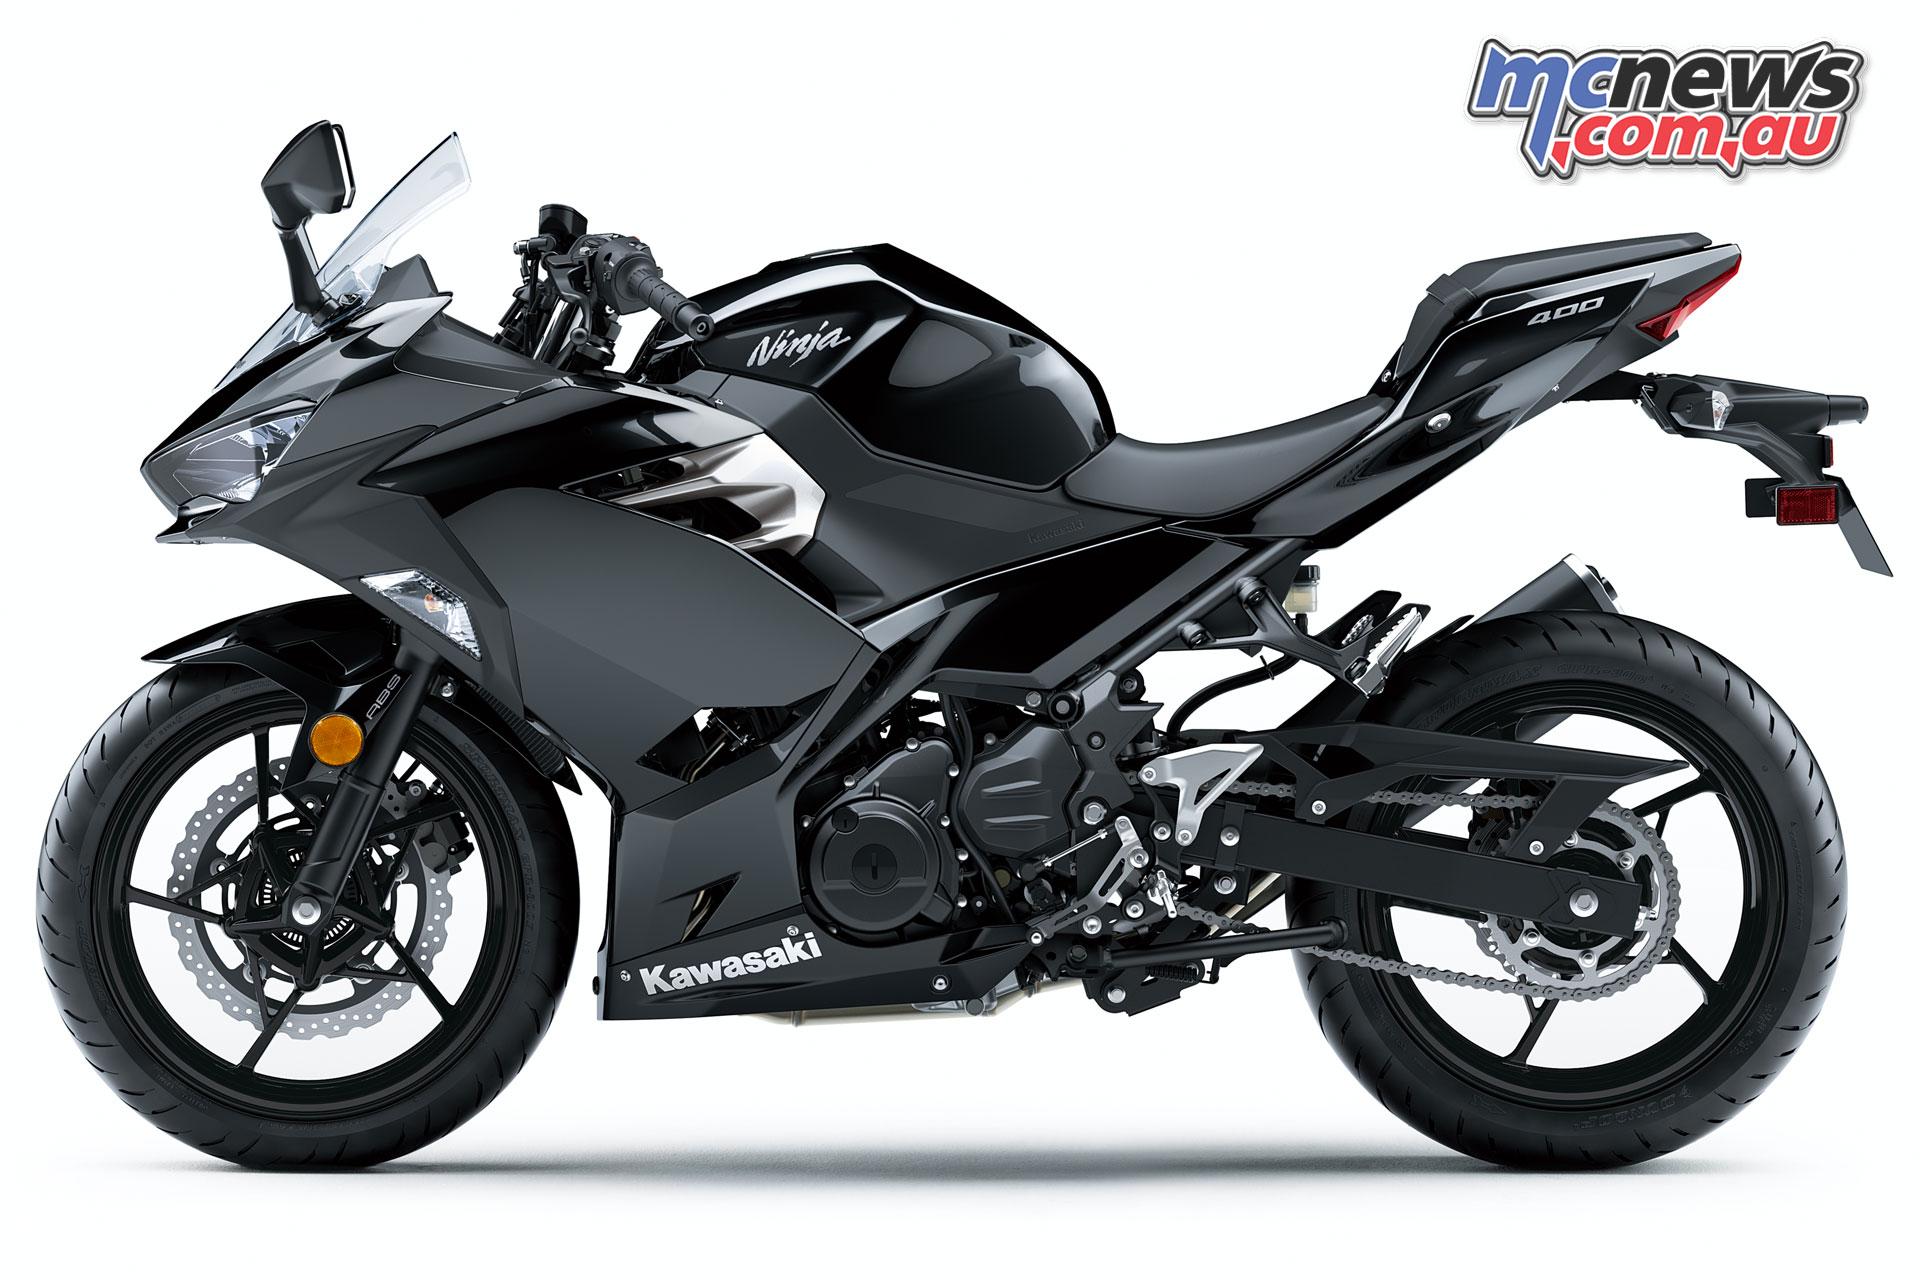 2018 Kawasaki Ninja 400 45hp 168kg Wet Mcnews Com Au